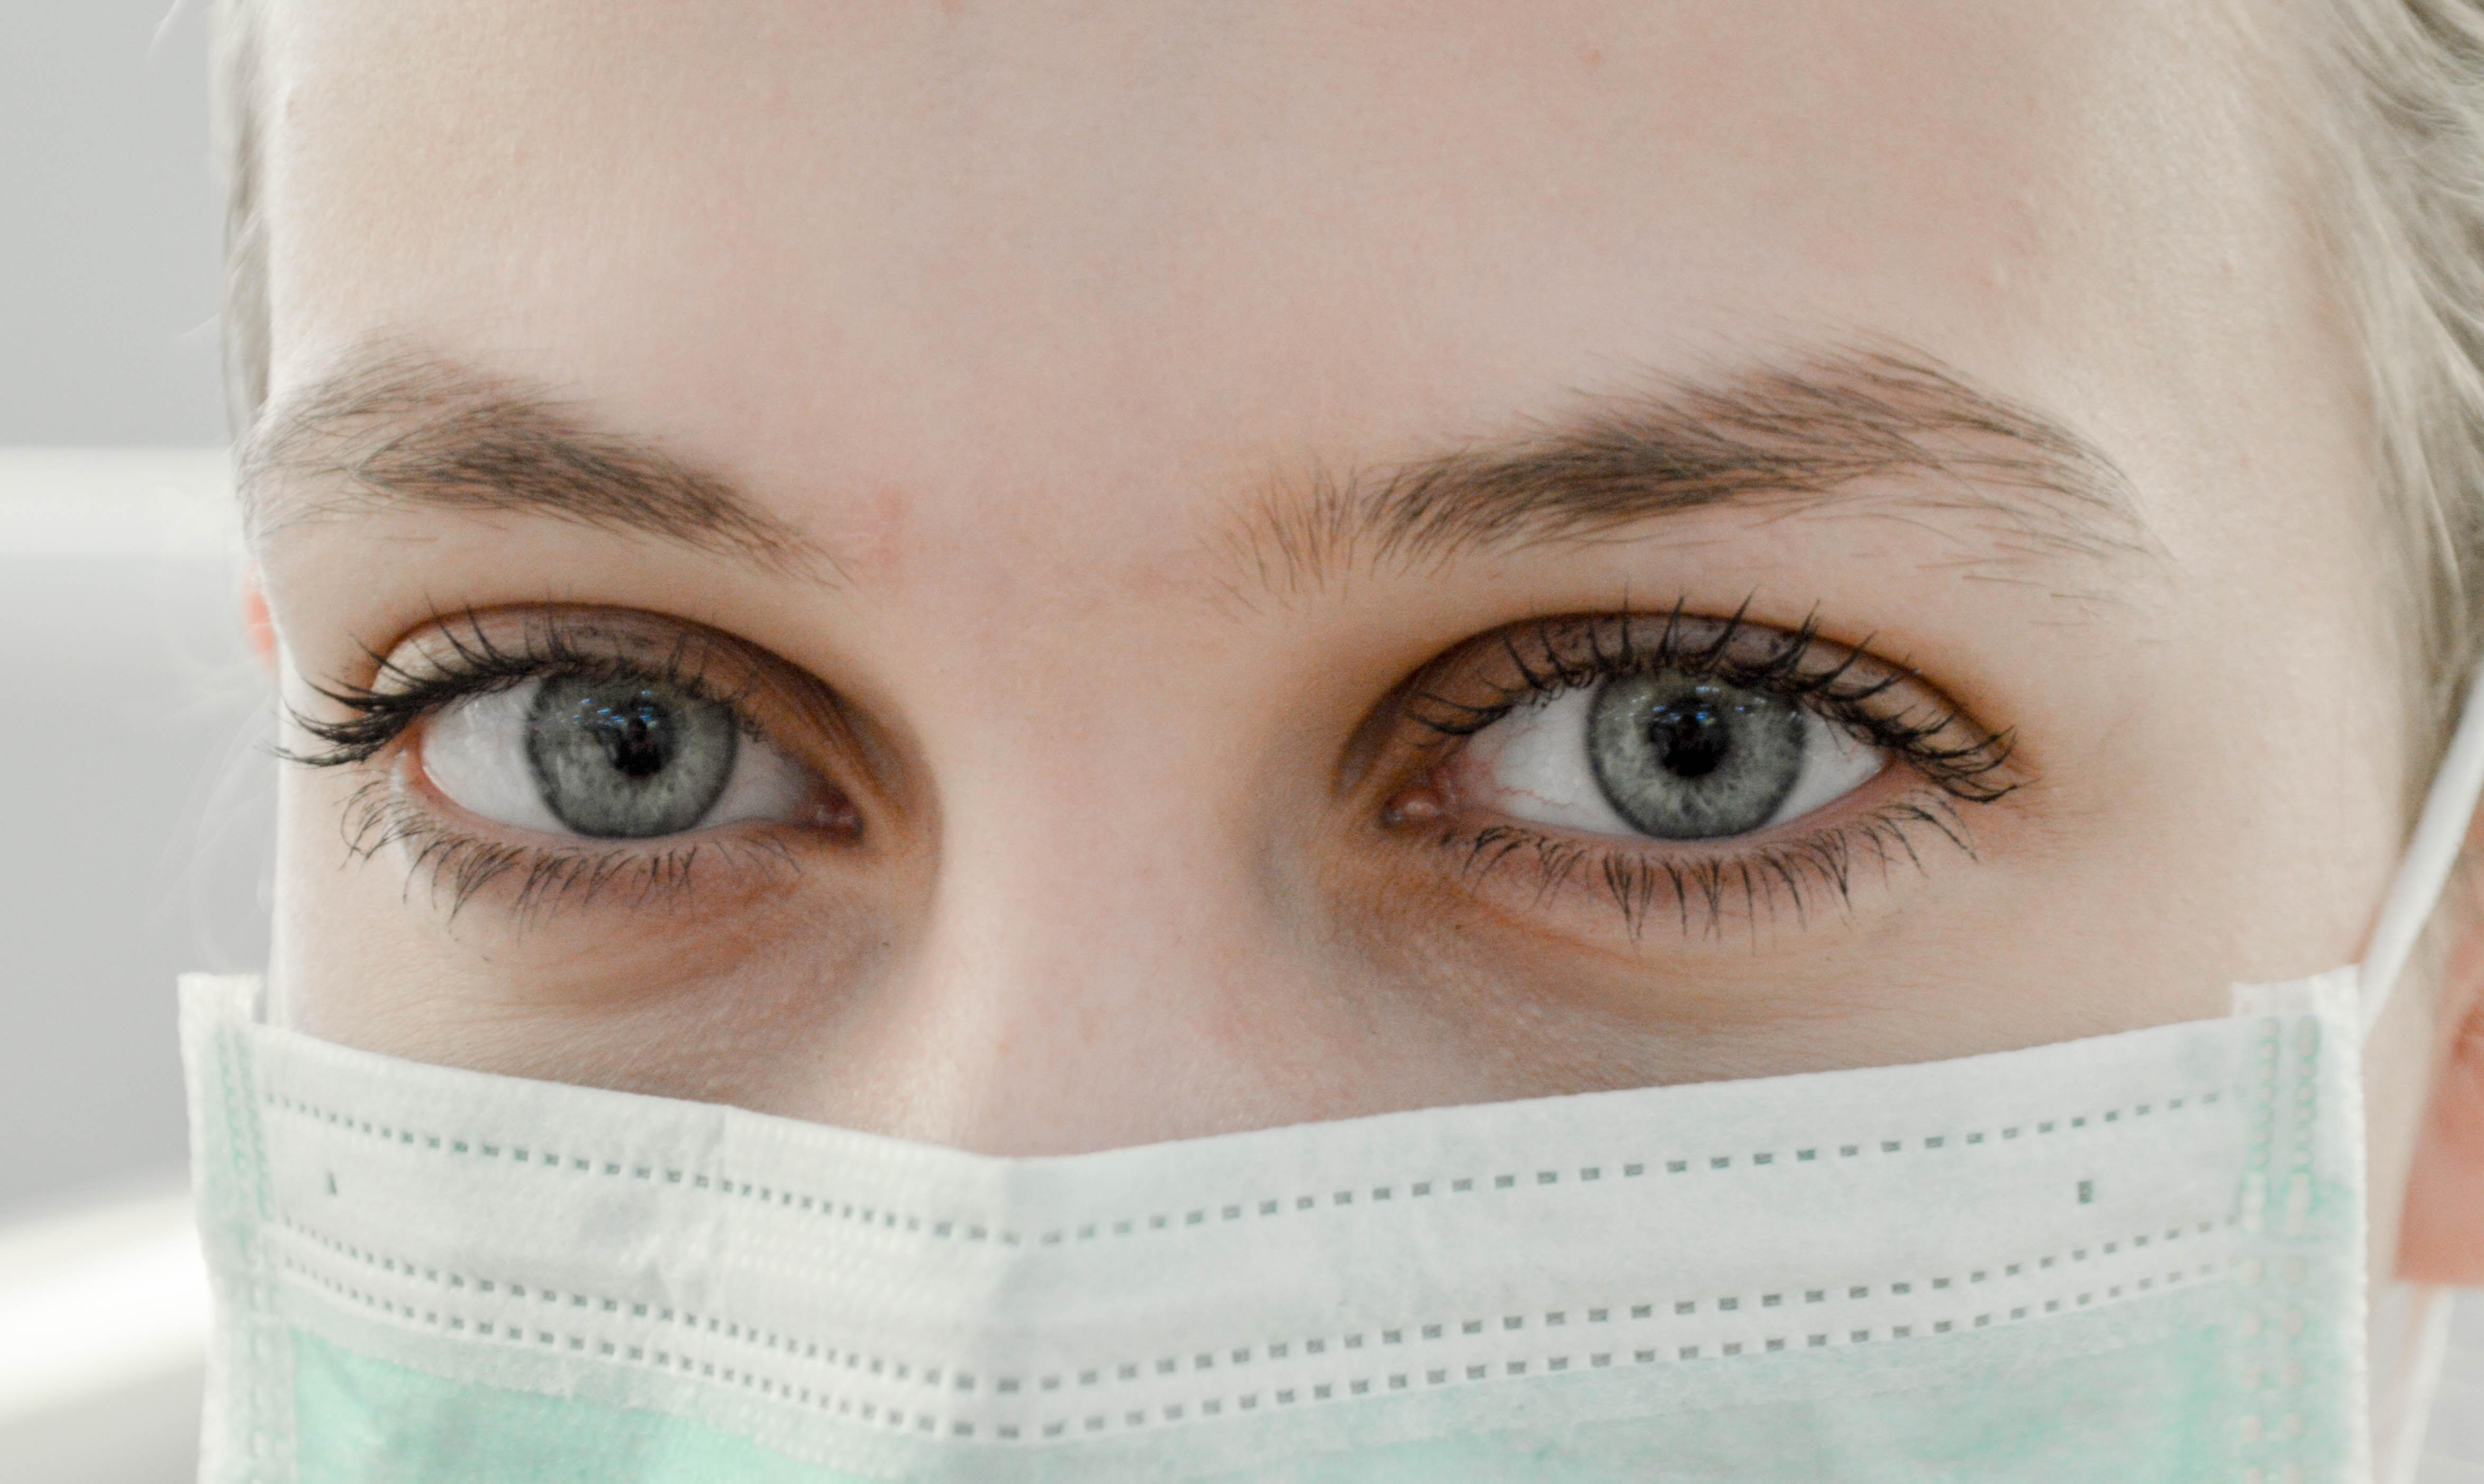 Canada declares coronavirus outbreak at long-term care home